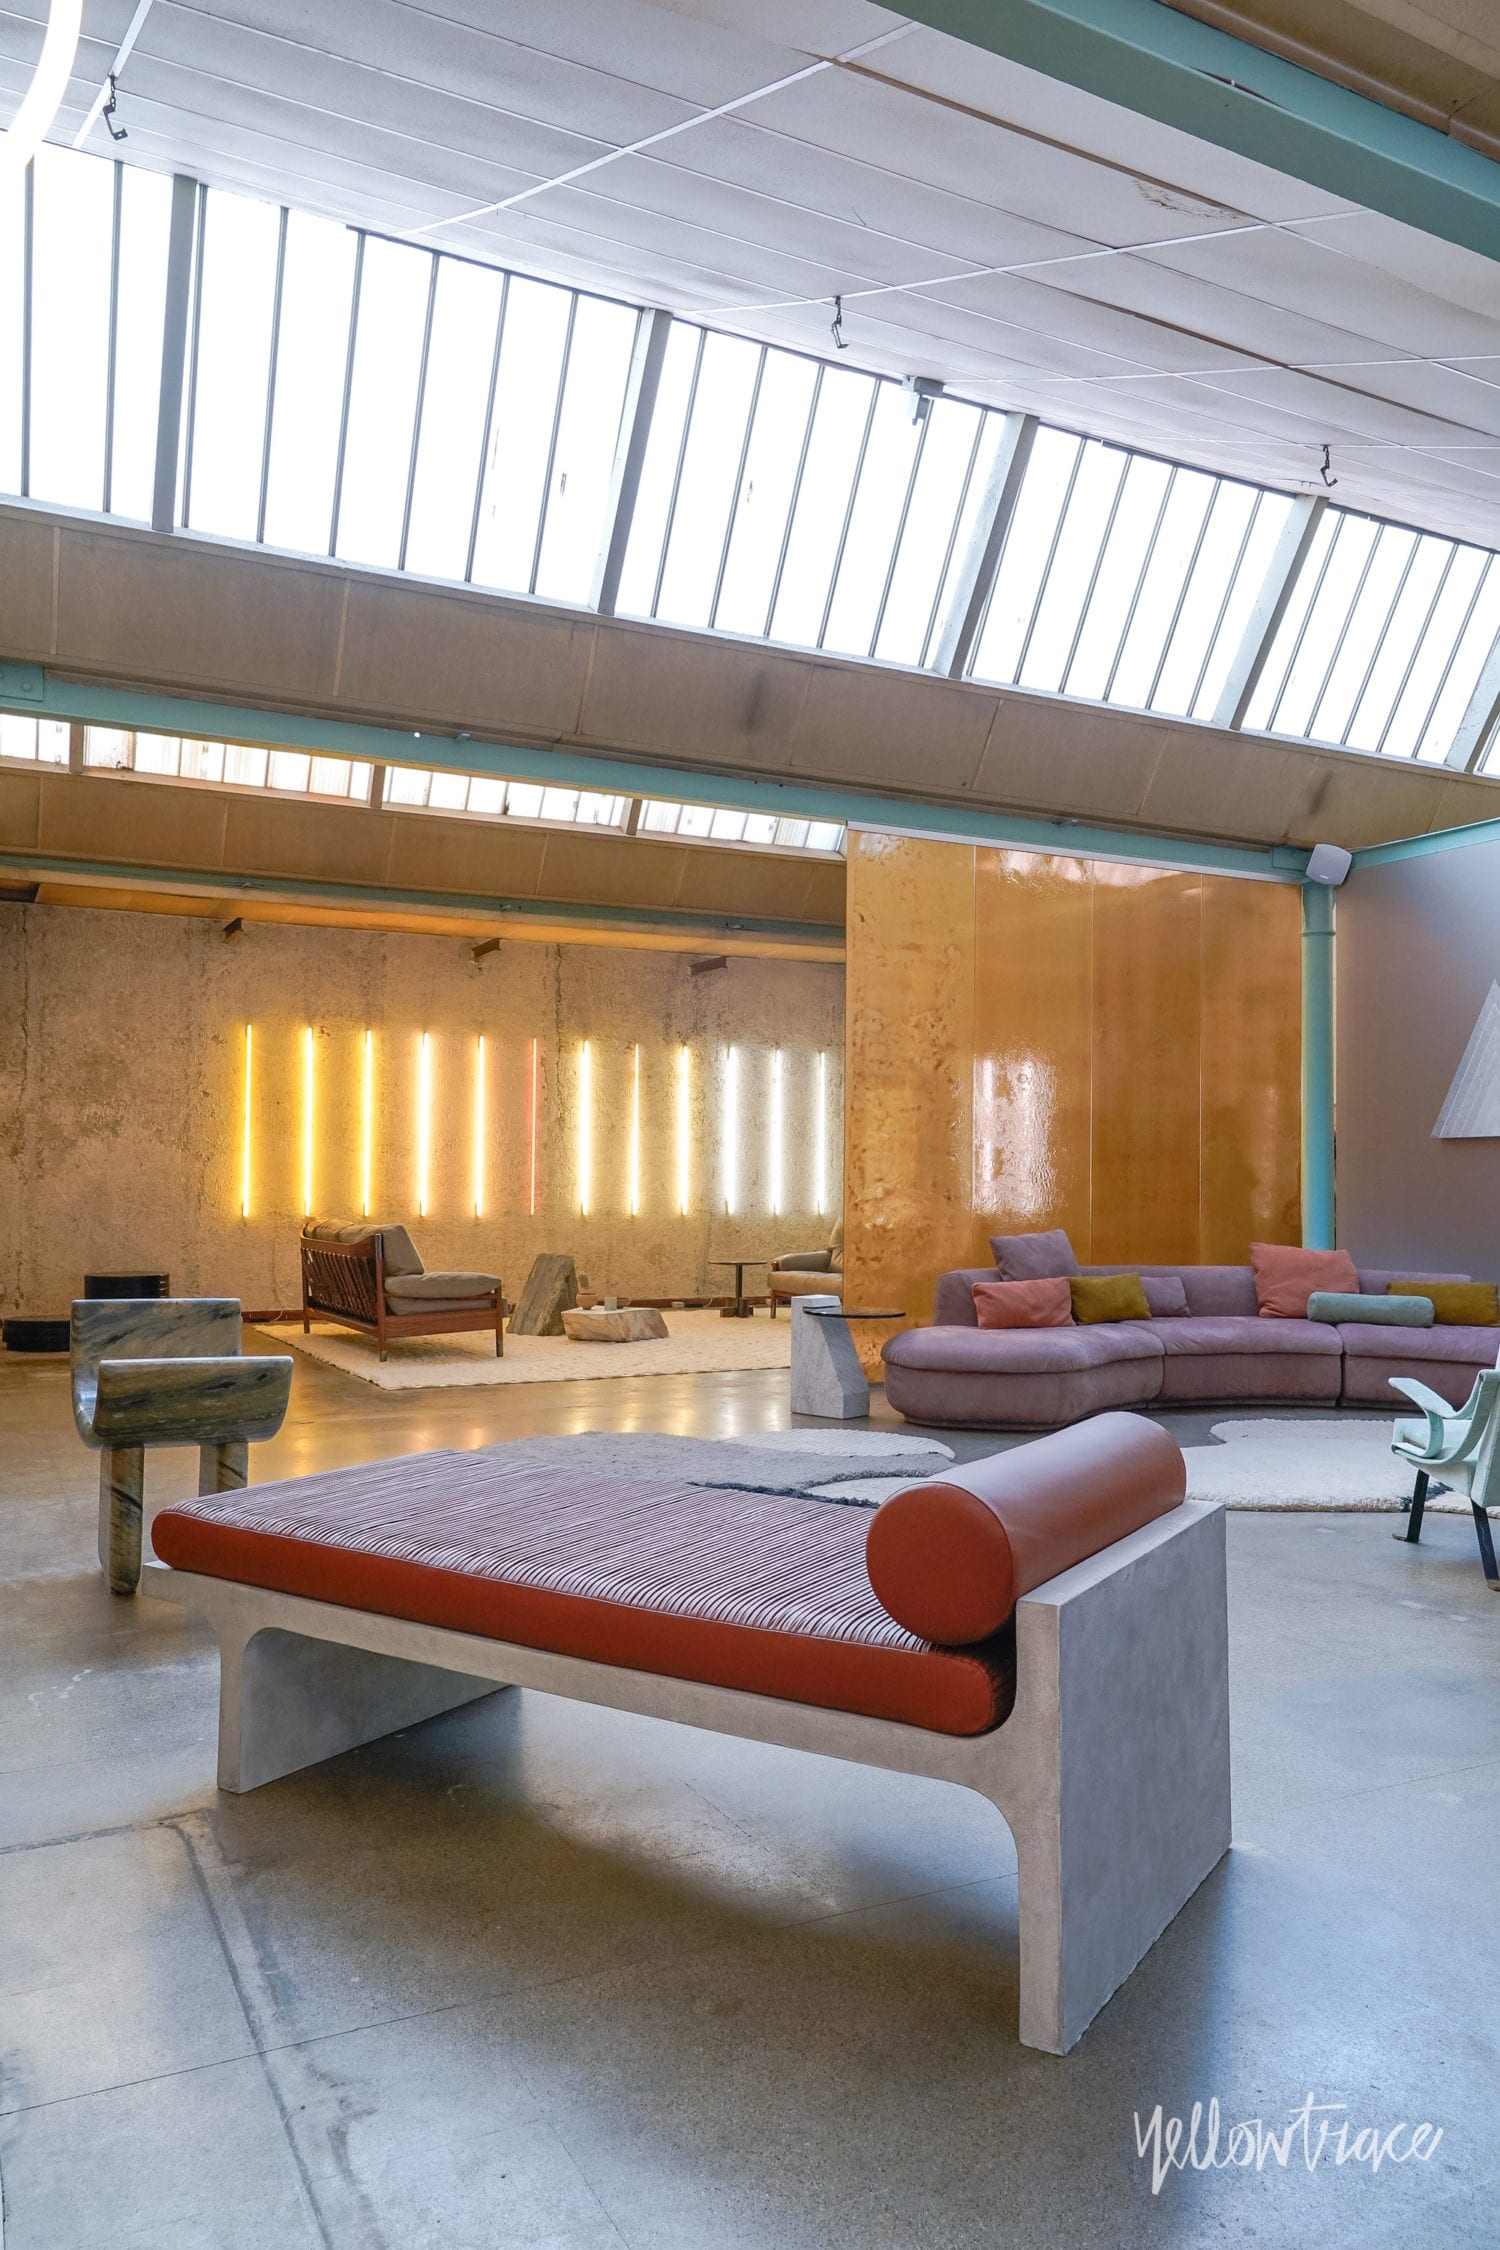 Les Arcanistes Studiopepe At Milan Design Week 2019 Photo Nick Hughes Yellowtrace 39